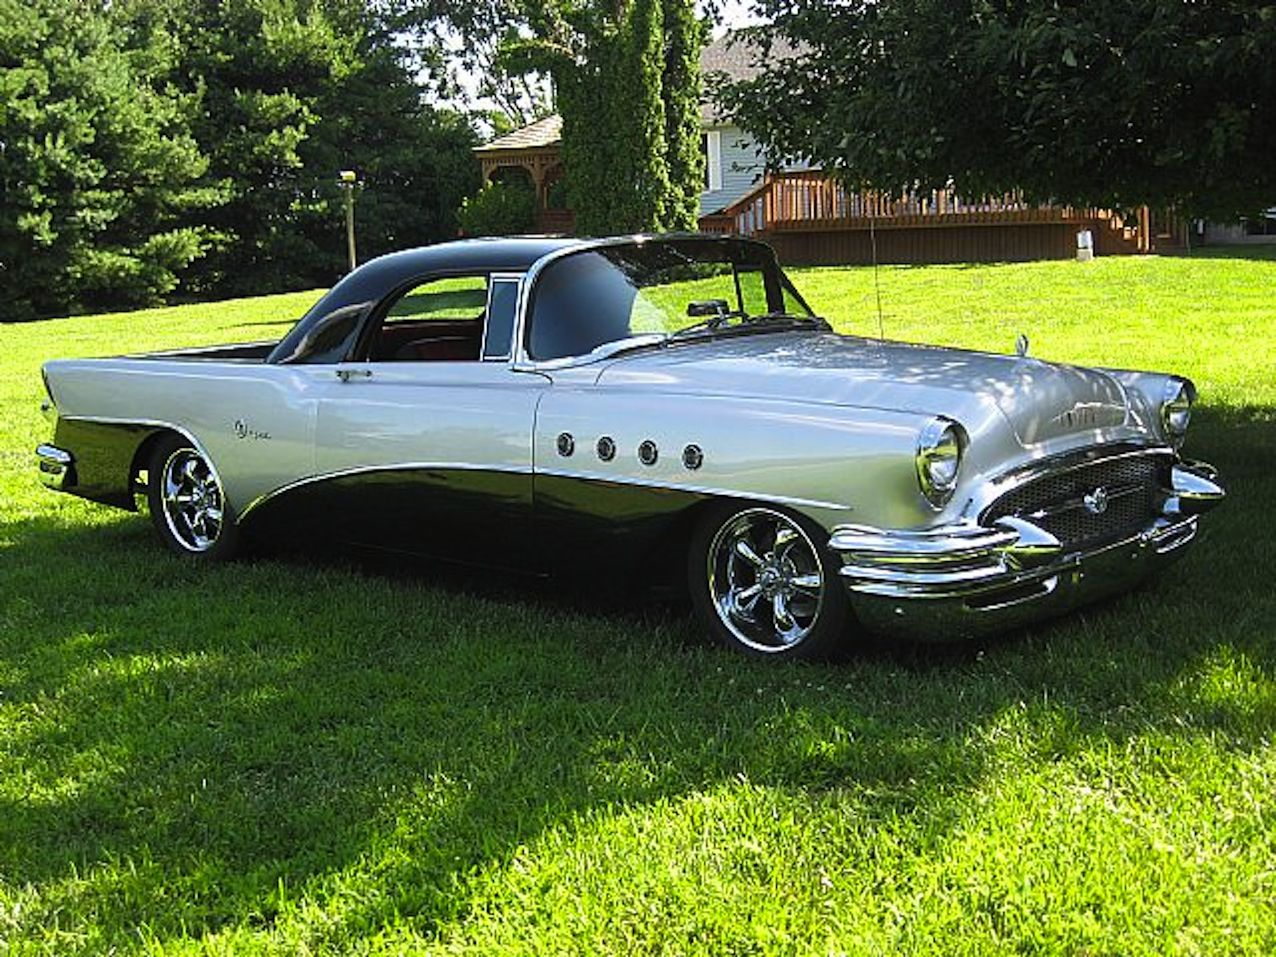 1955 Buick Super Caballero | THE ART OF CARS | Pinterest | Cars